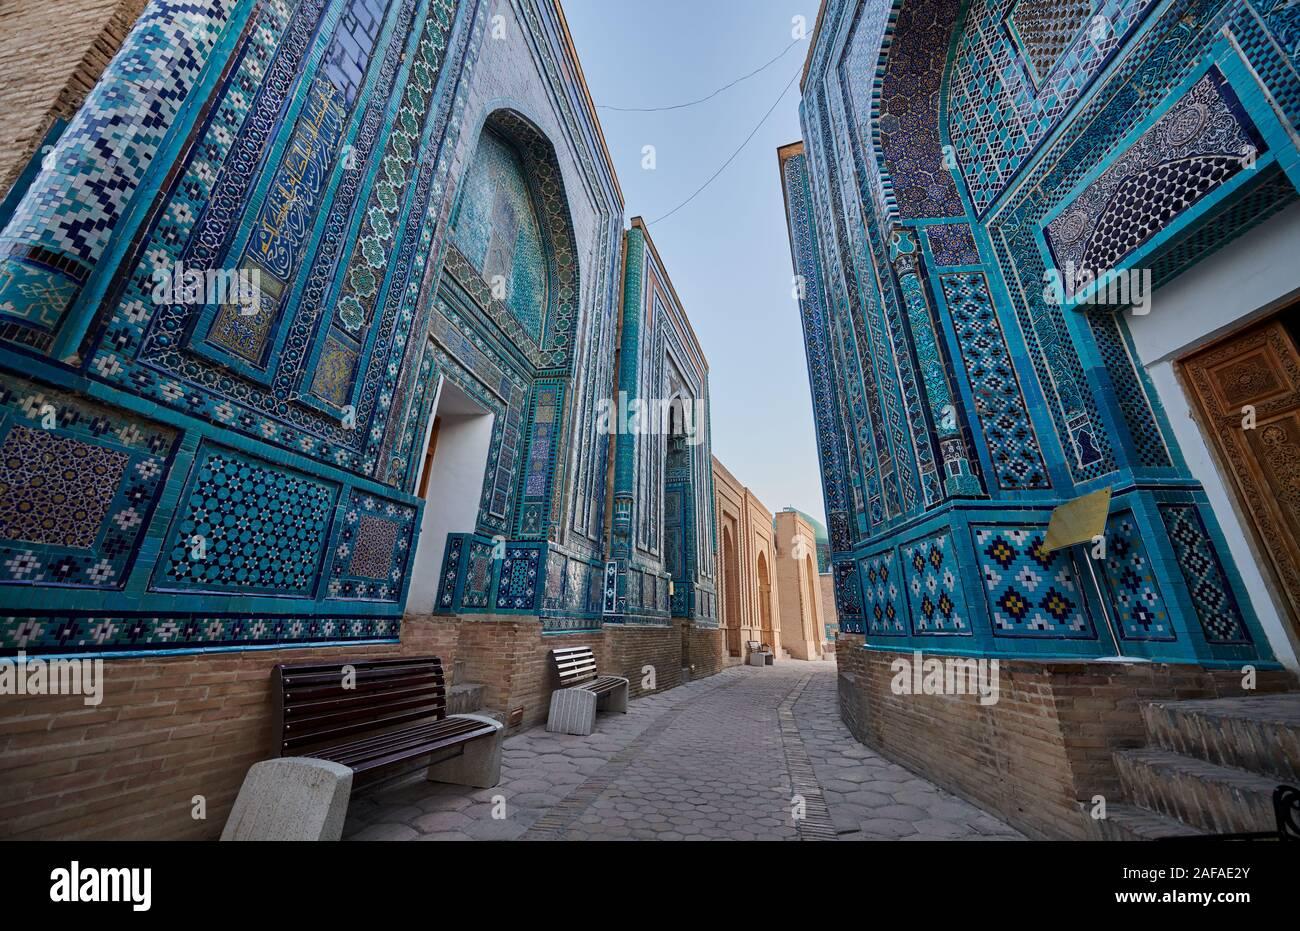 narrow path through facades heavily decorated with blue tiles in necropolis Shah-i-Zinda, Samarqand, Uzbekistan, Central Asia Stock Photo